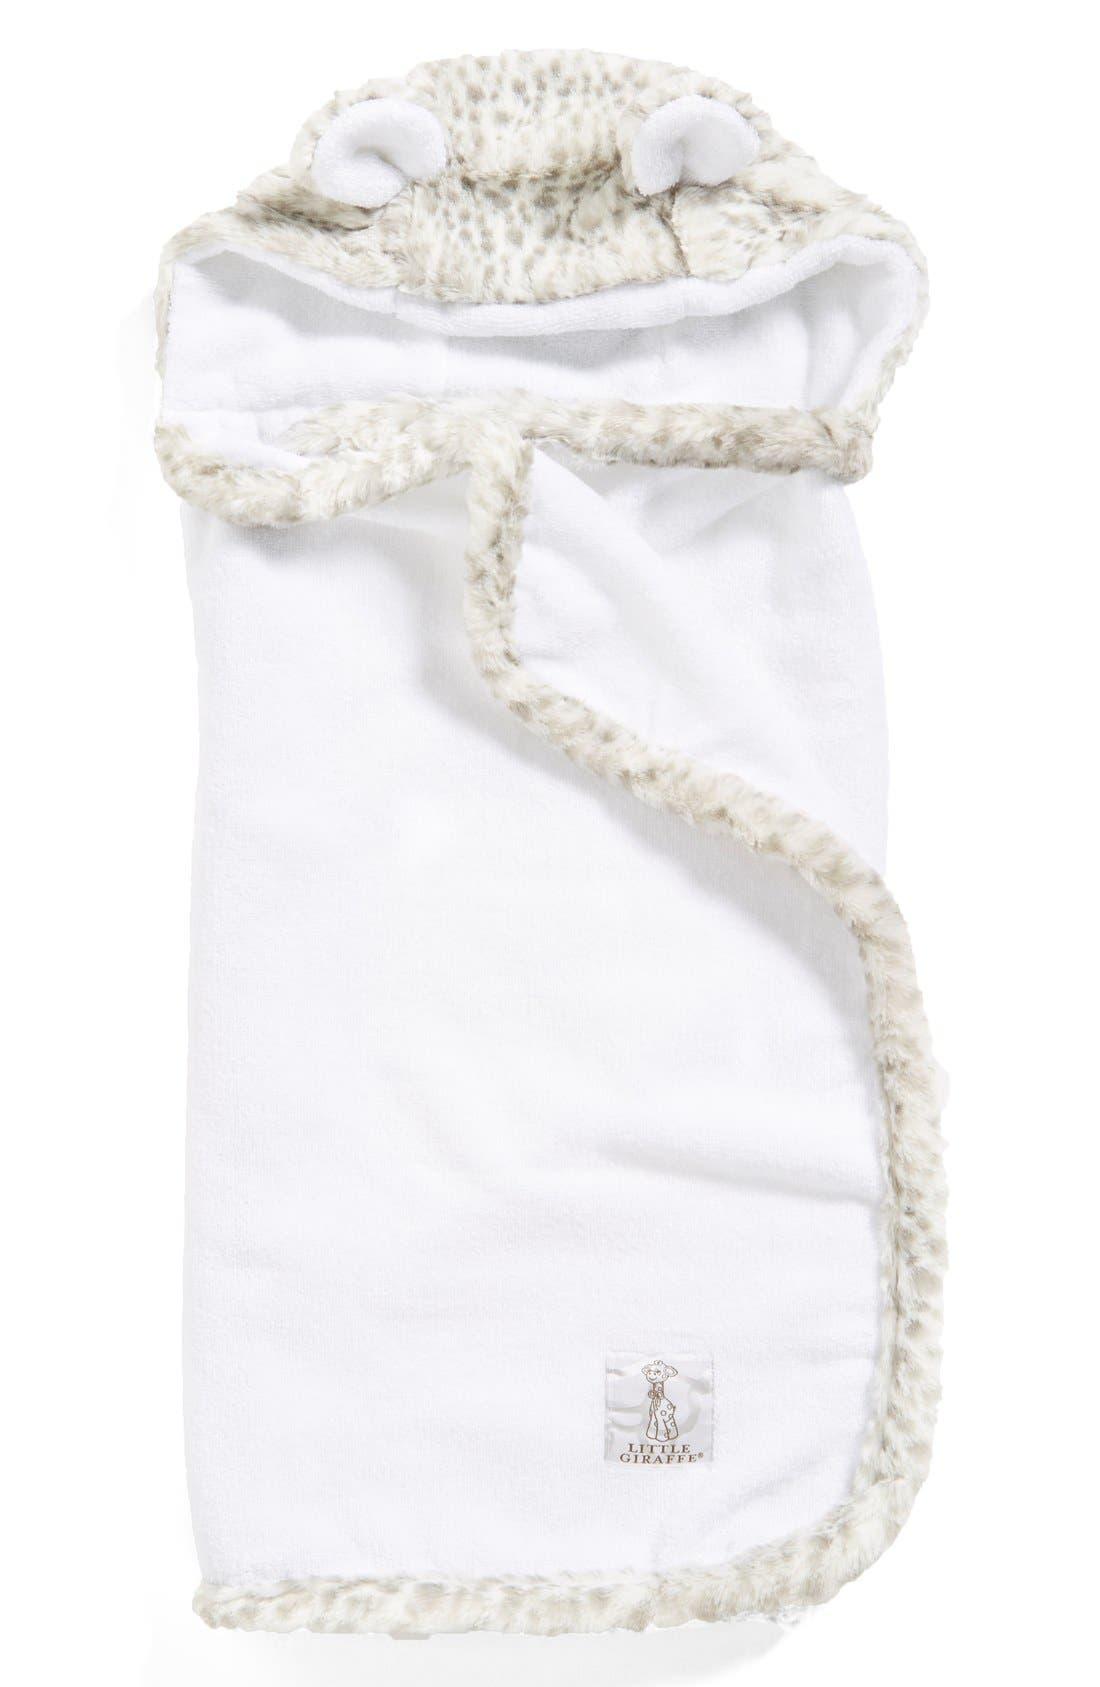 Main Image - Little Giraffe 'Luxe Snow Leopard' Hooded Towel (Baby)